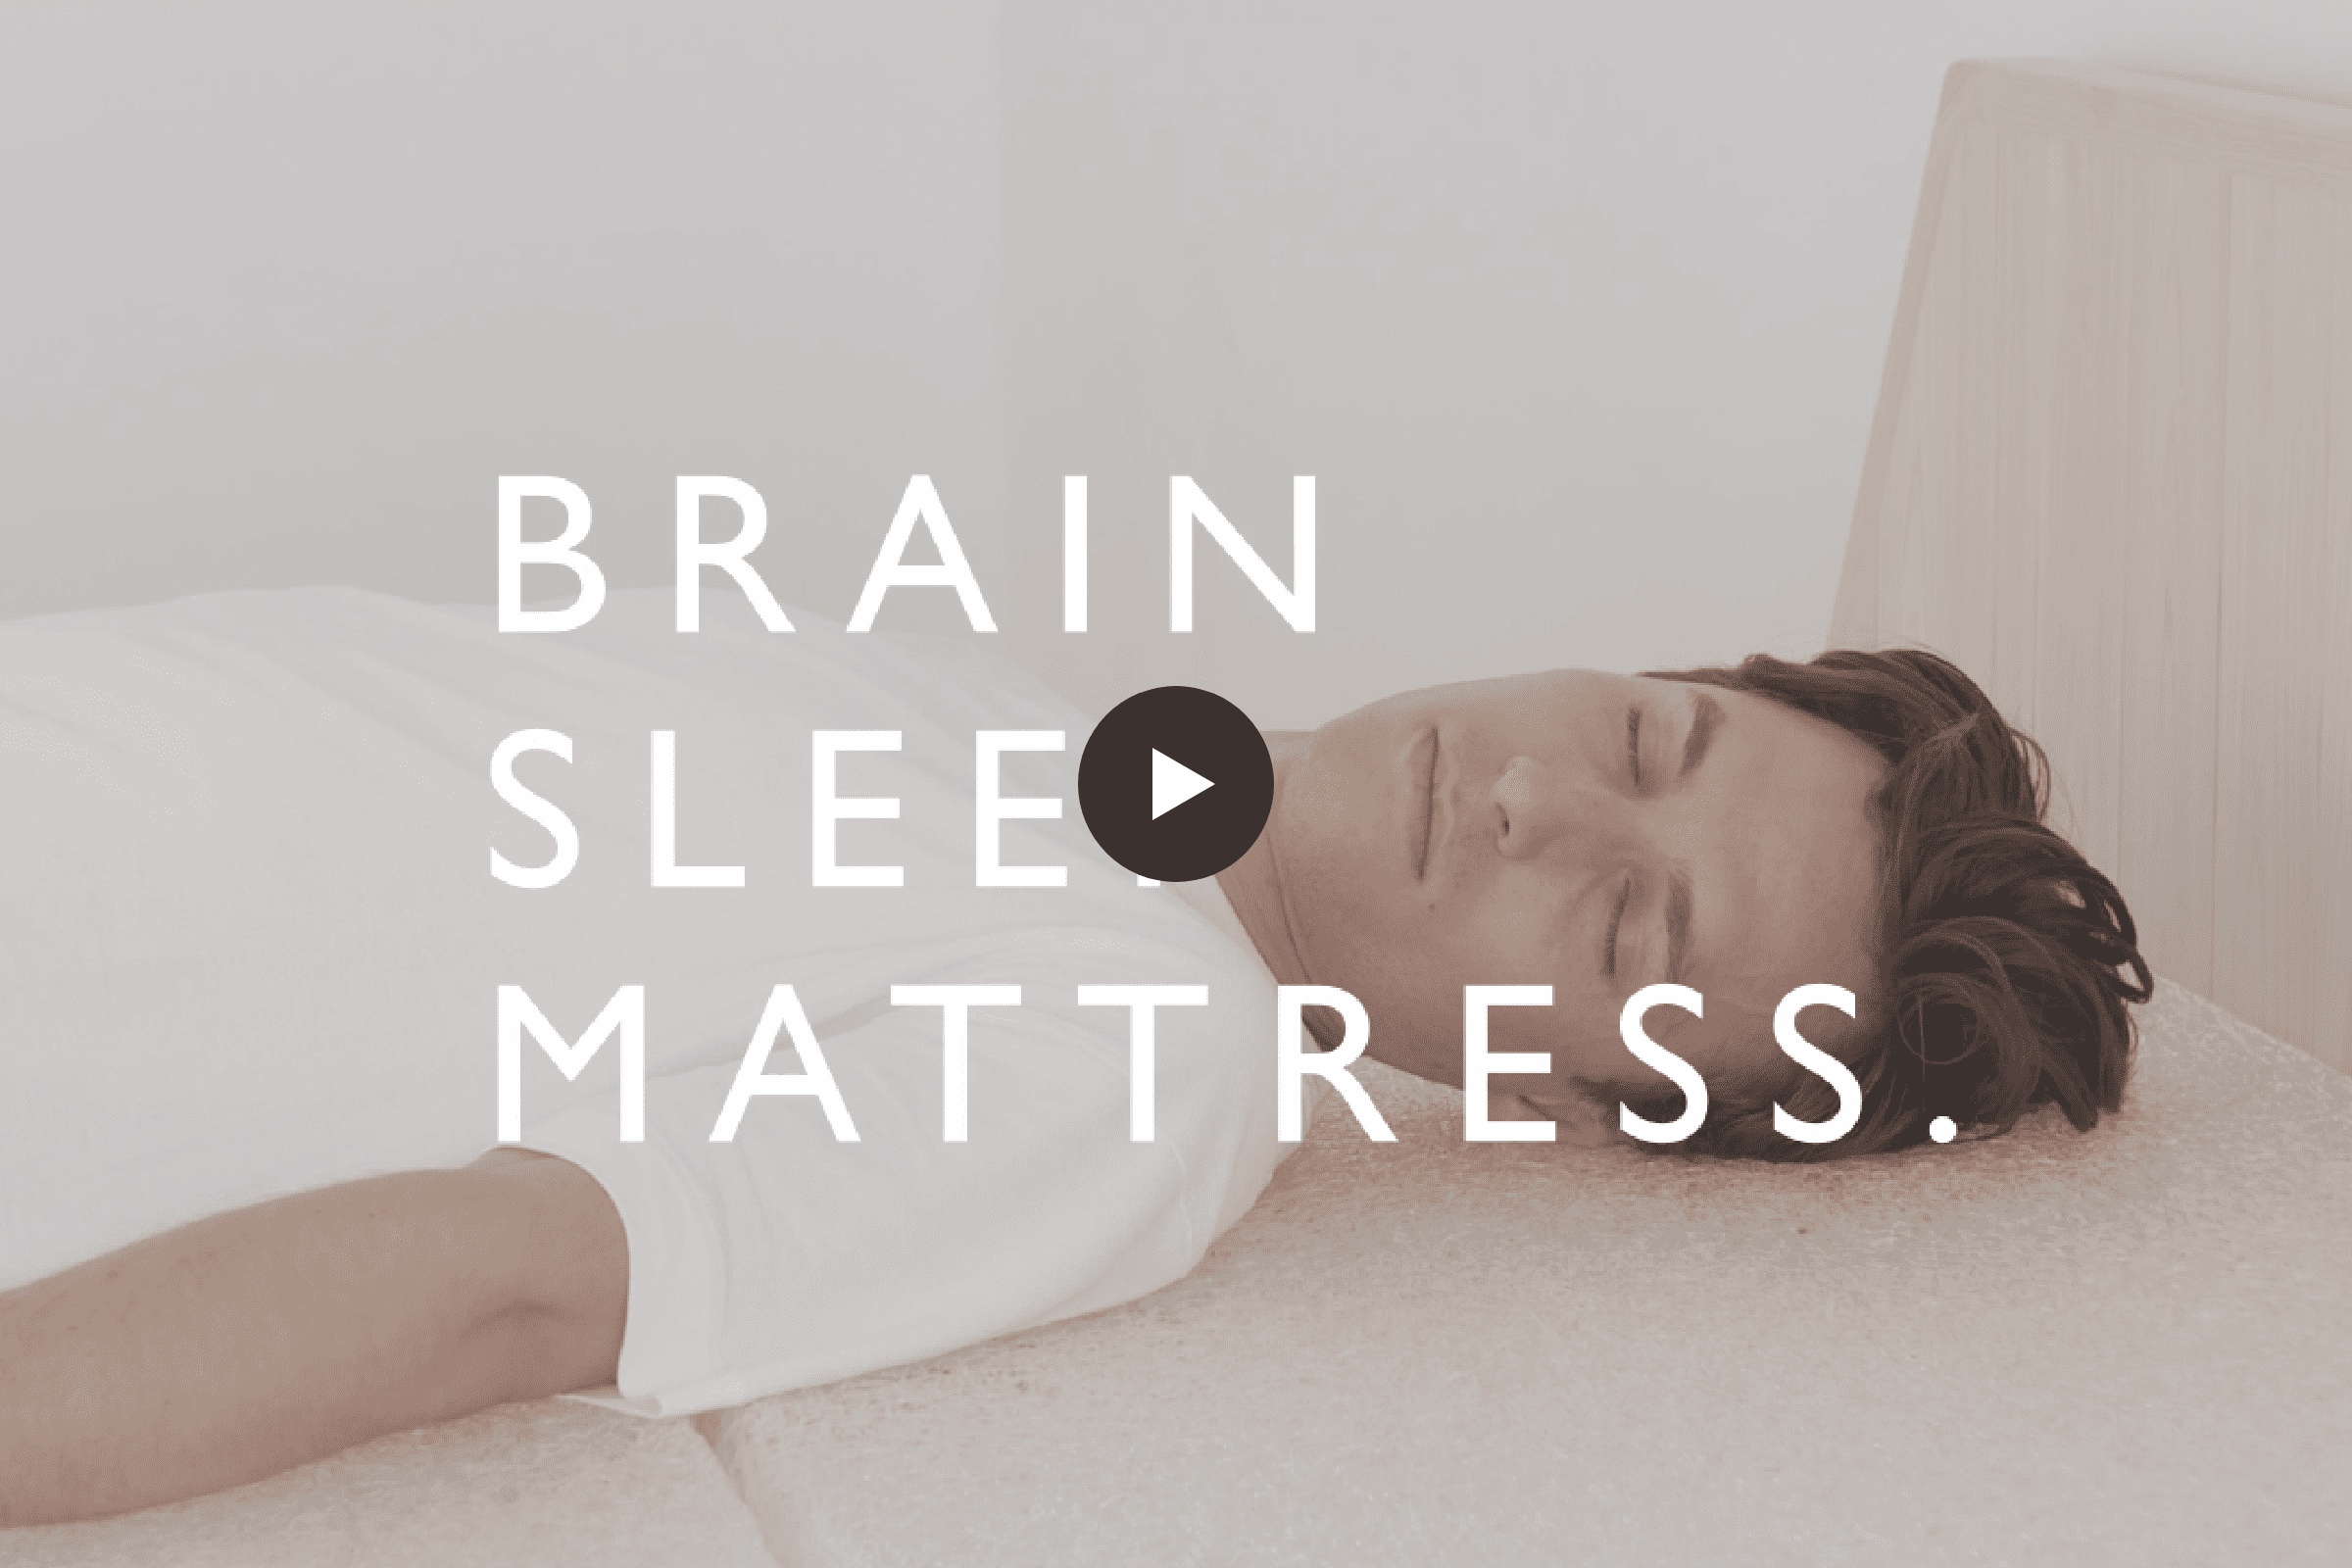 BRAIN SLEEP MATTRESS